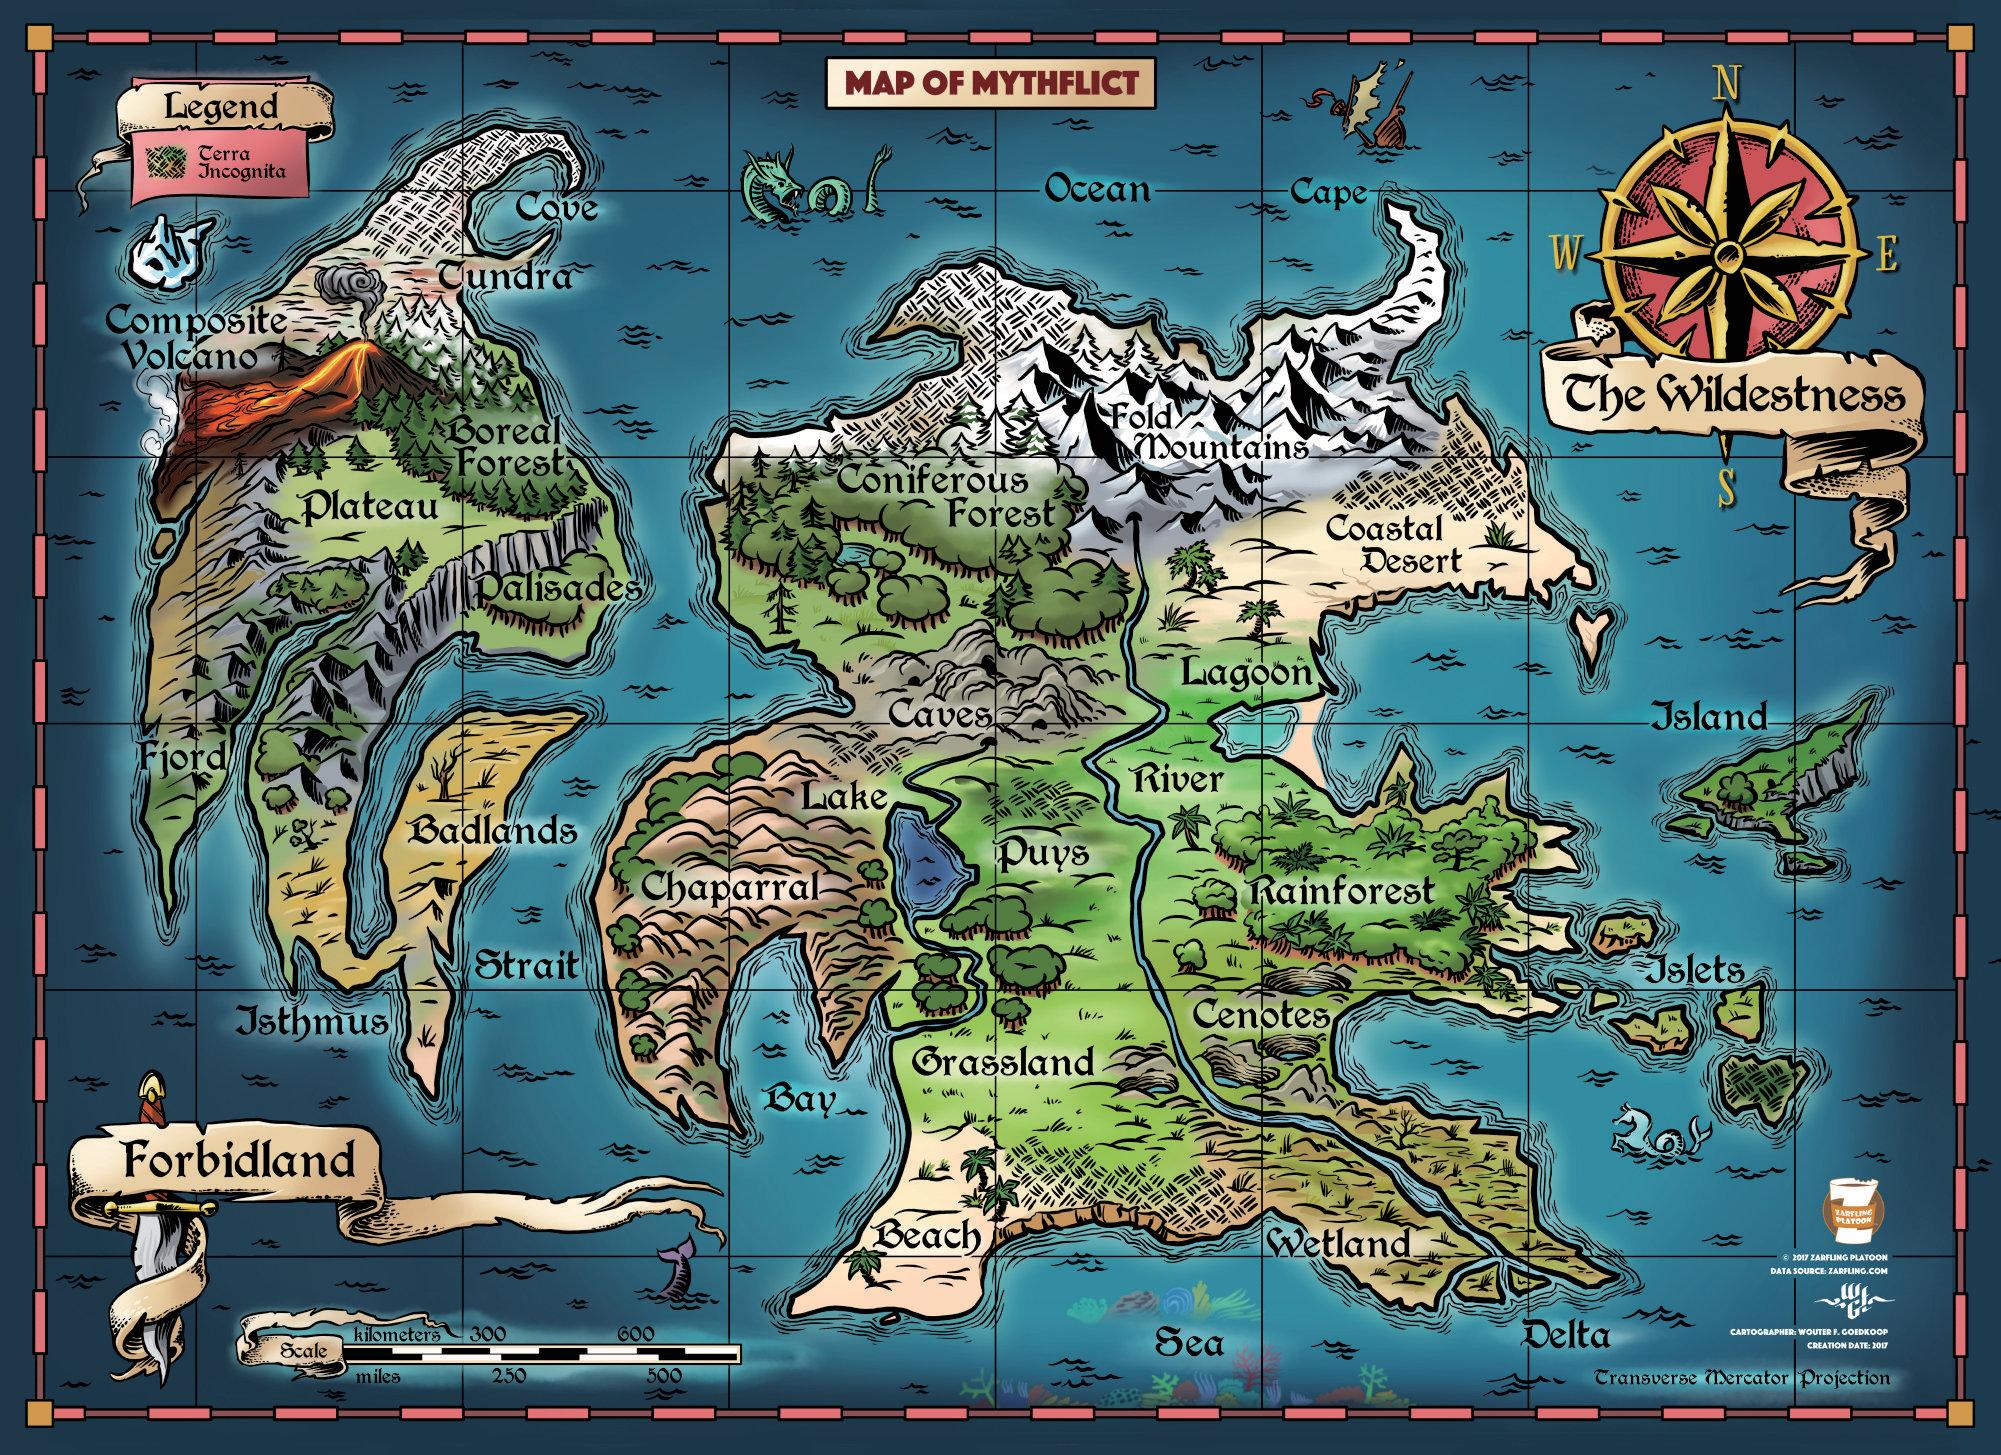 Wildestness__Forbidland_map_websize.jpg